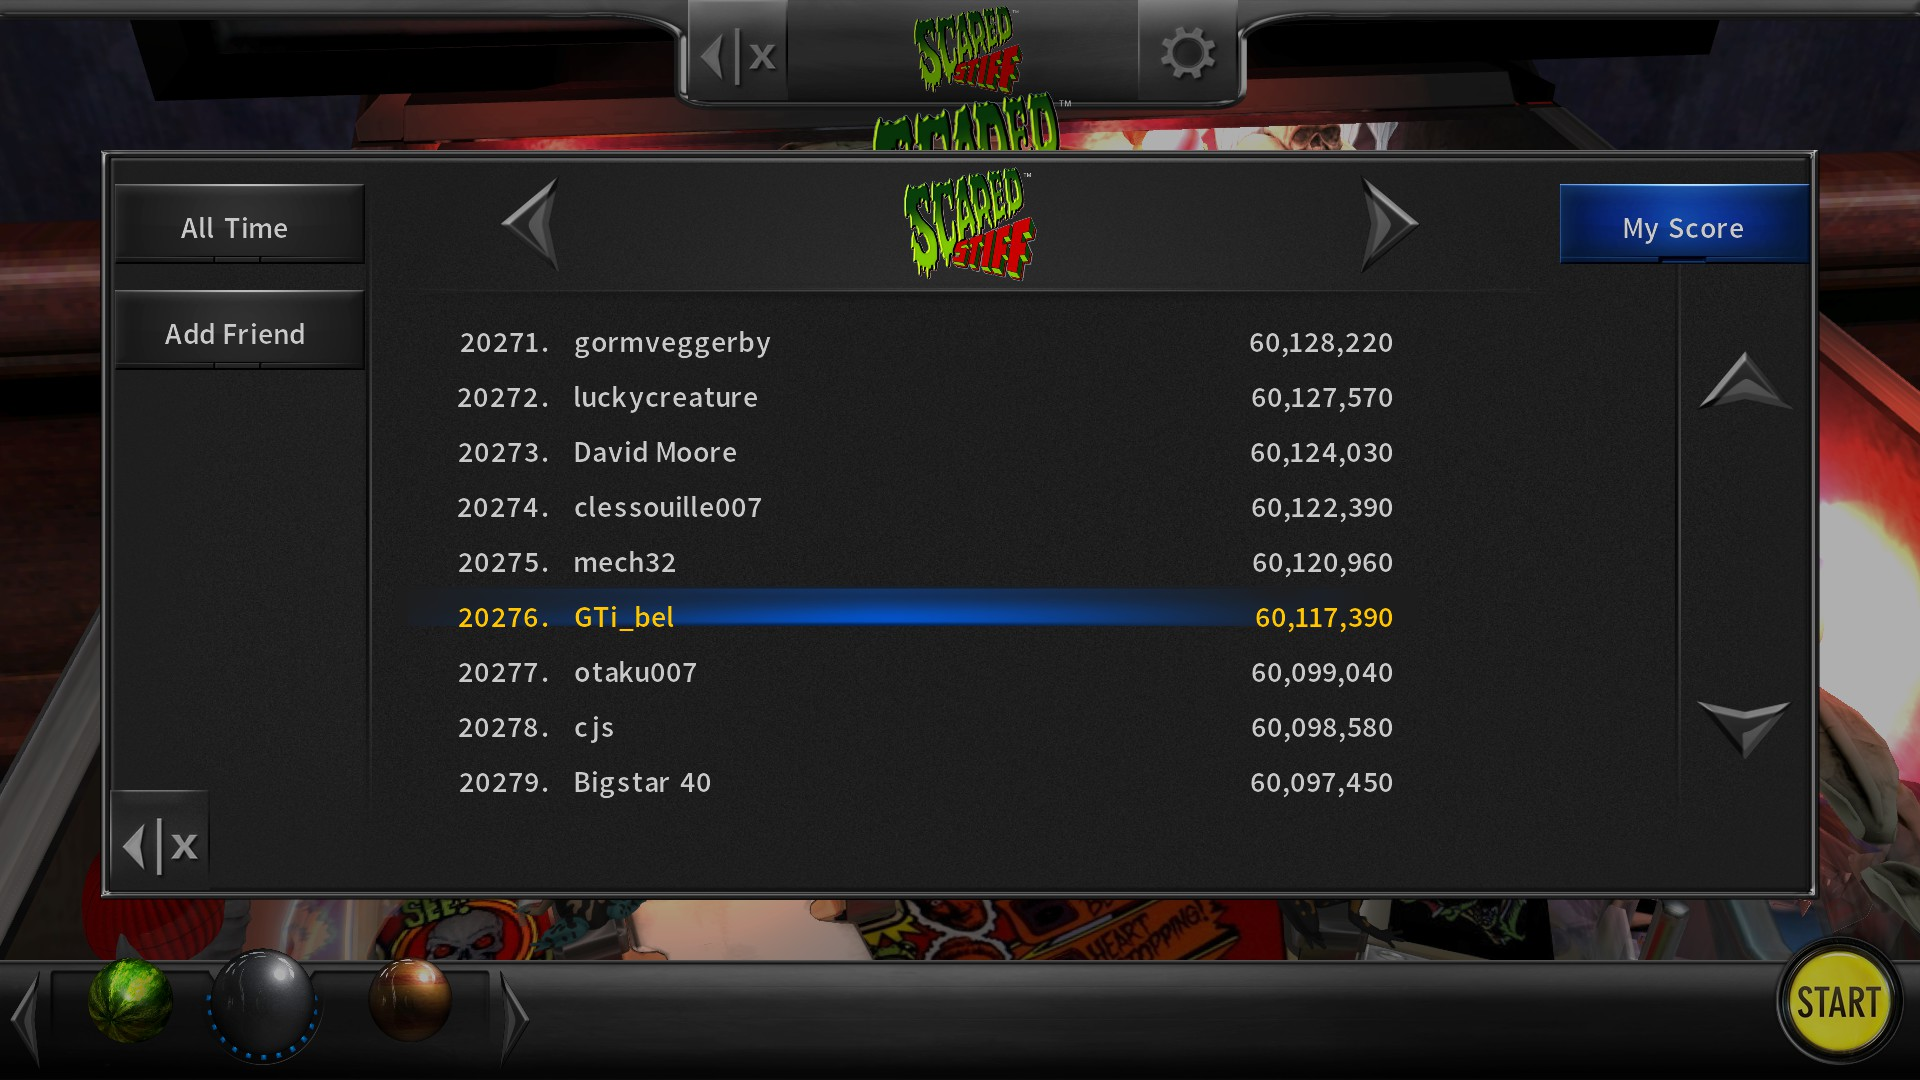 GTibel: Pinball Arcade: Scared Stiff (PC) 60,117,390 points on 2020-07-23 07:38:55